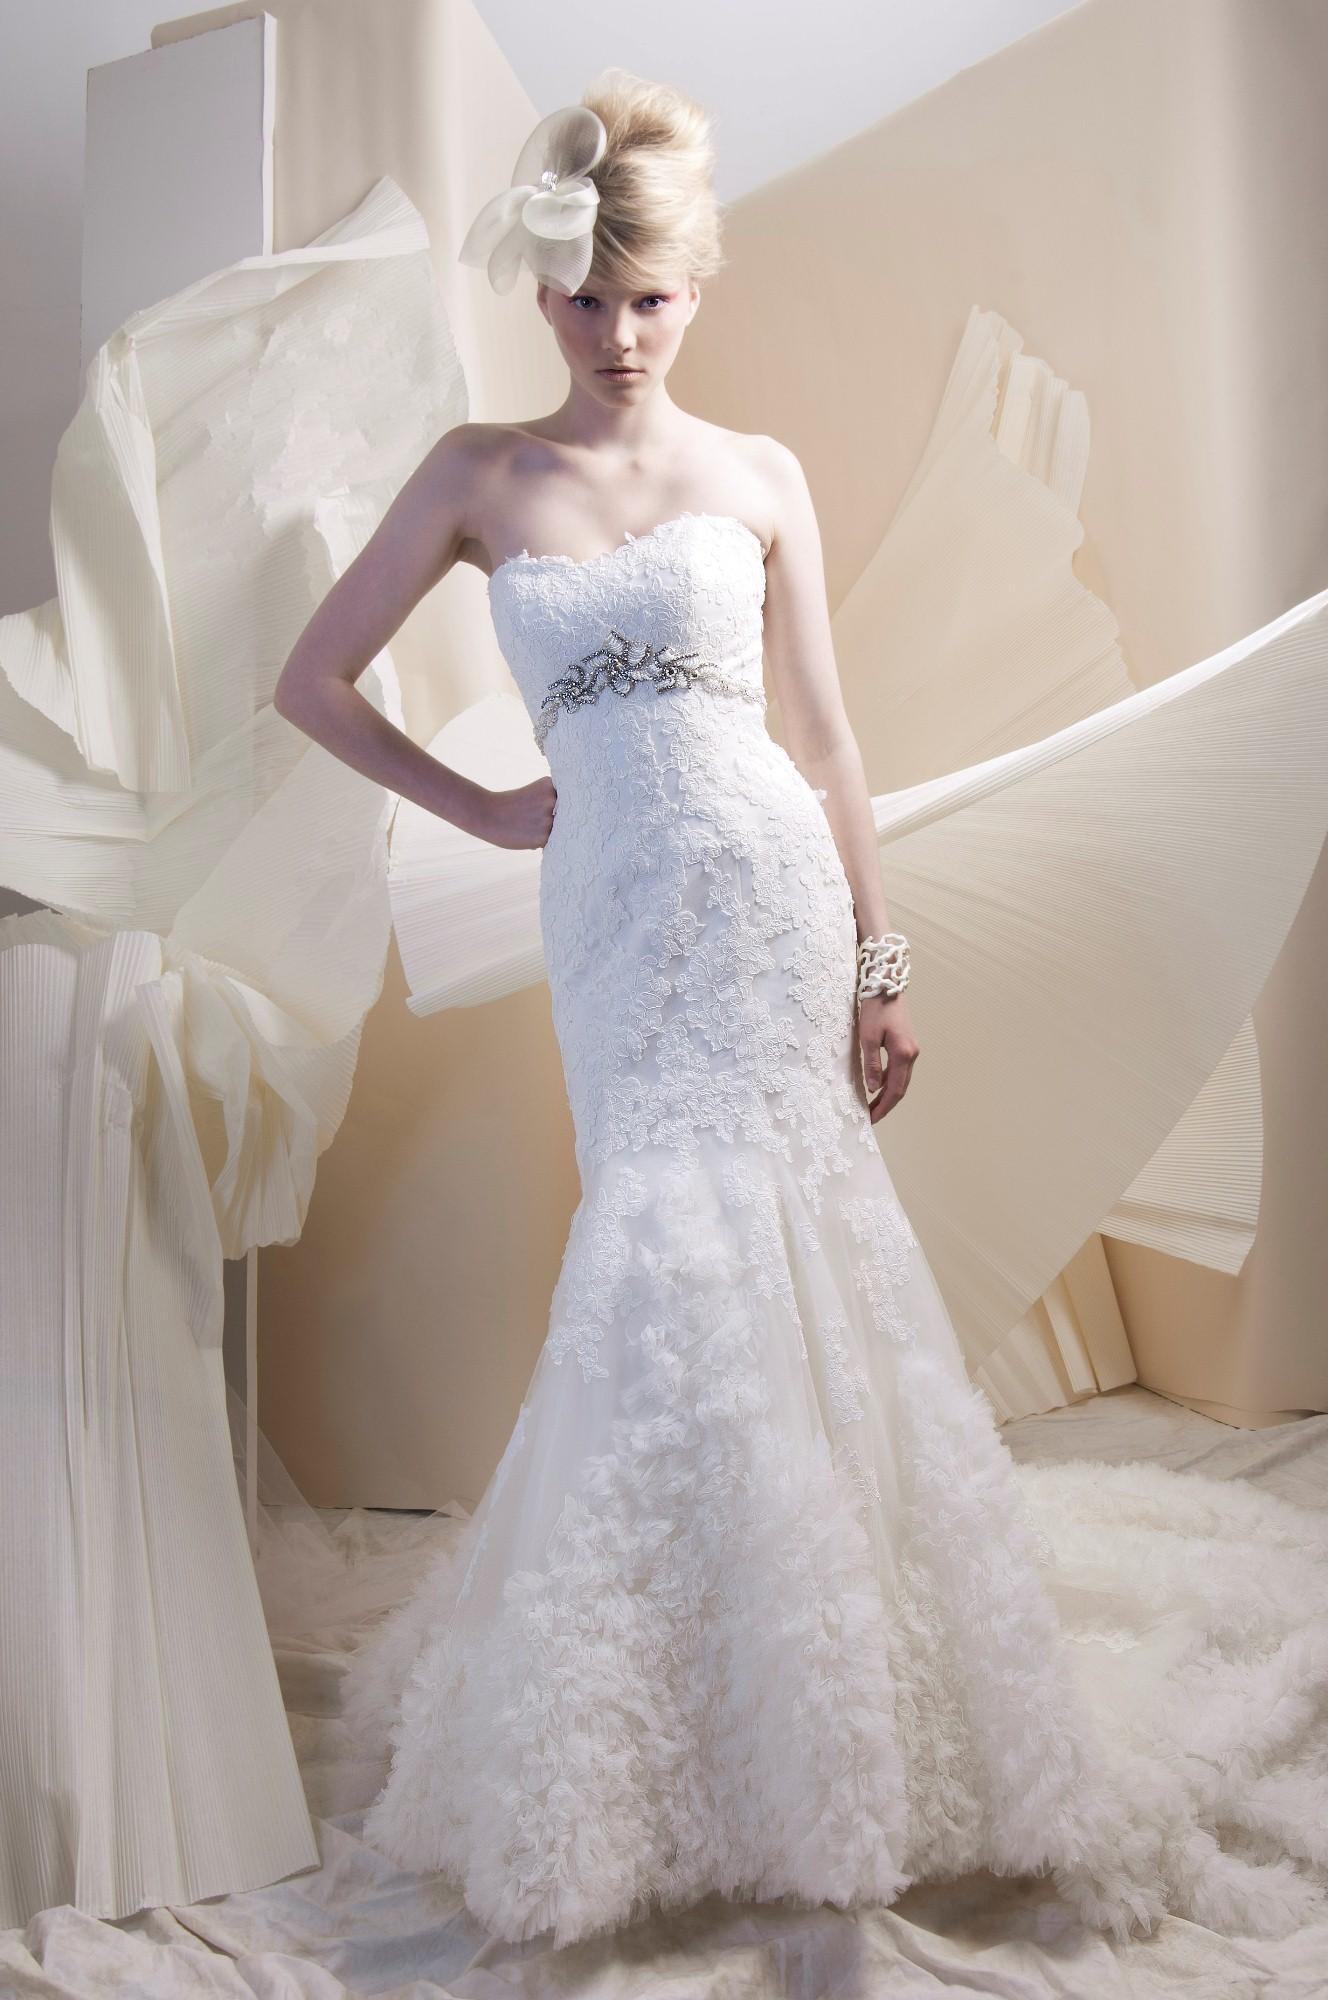 dress alfred sung spring 2013 bridal 6916 lace tulle alfredsung bridal. Black Bedroom Furniture Sets. Home Design Ideas